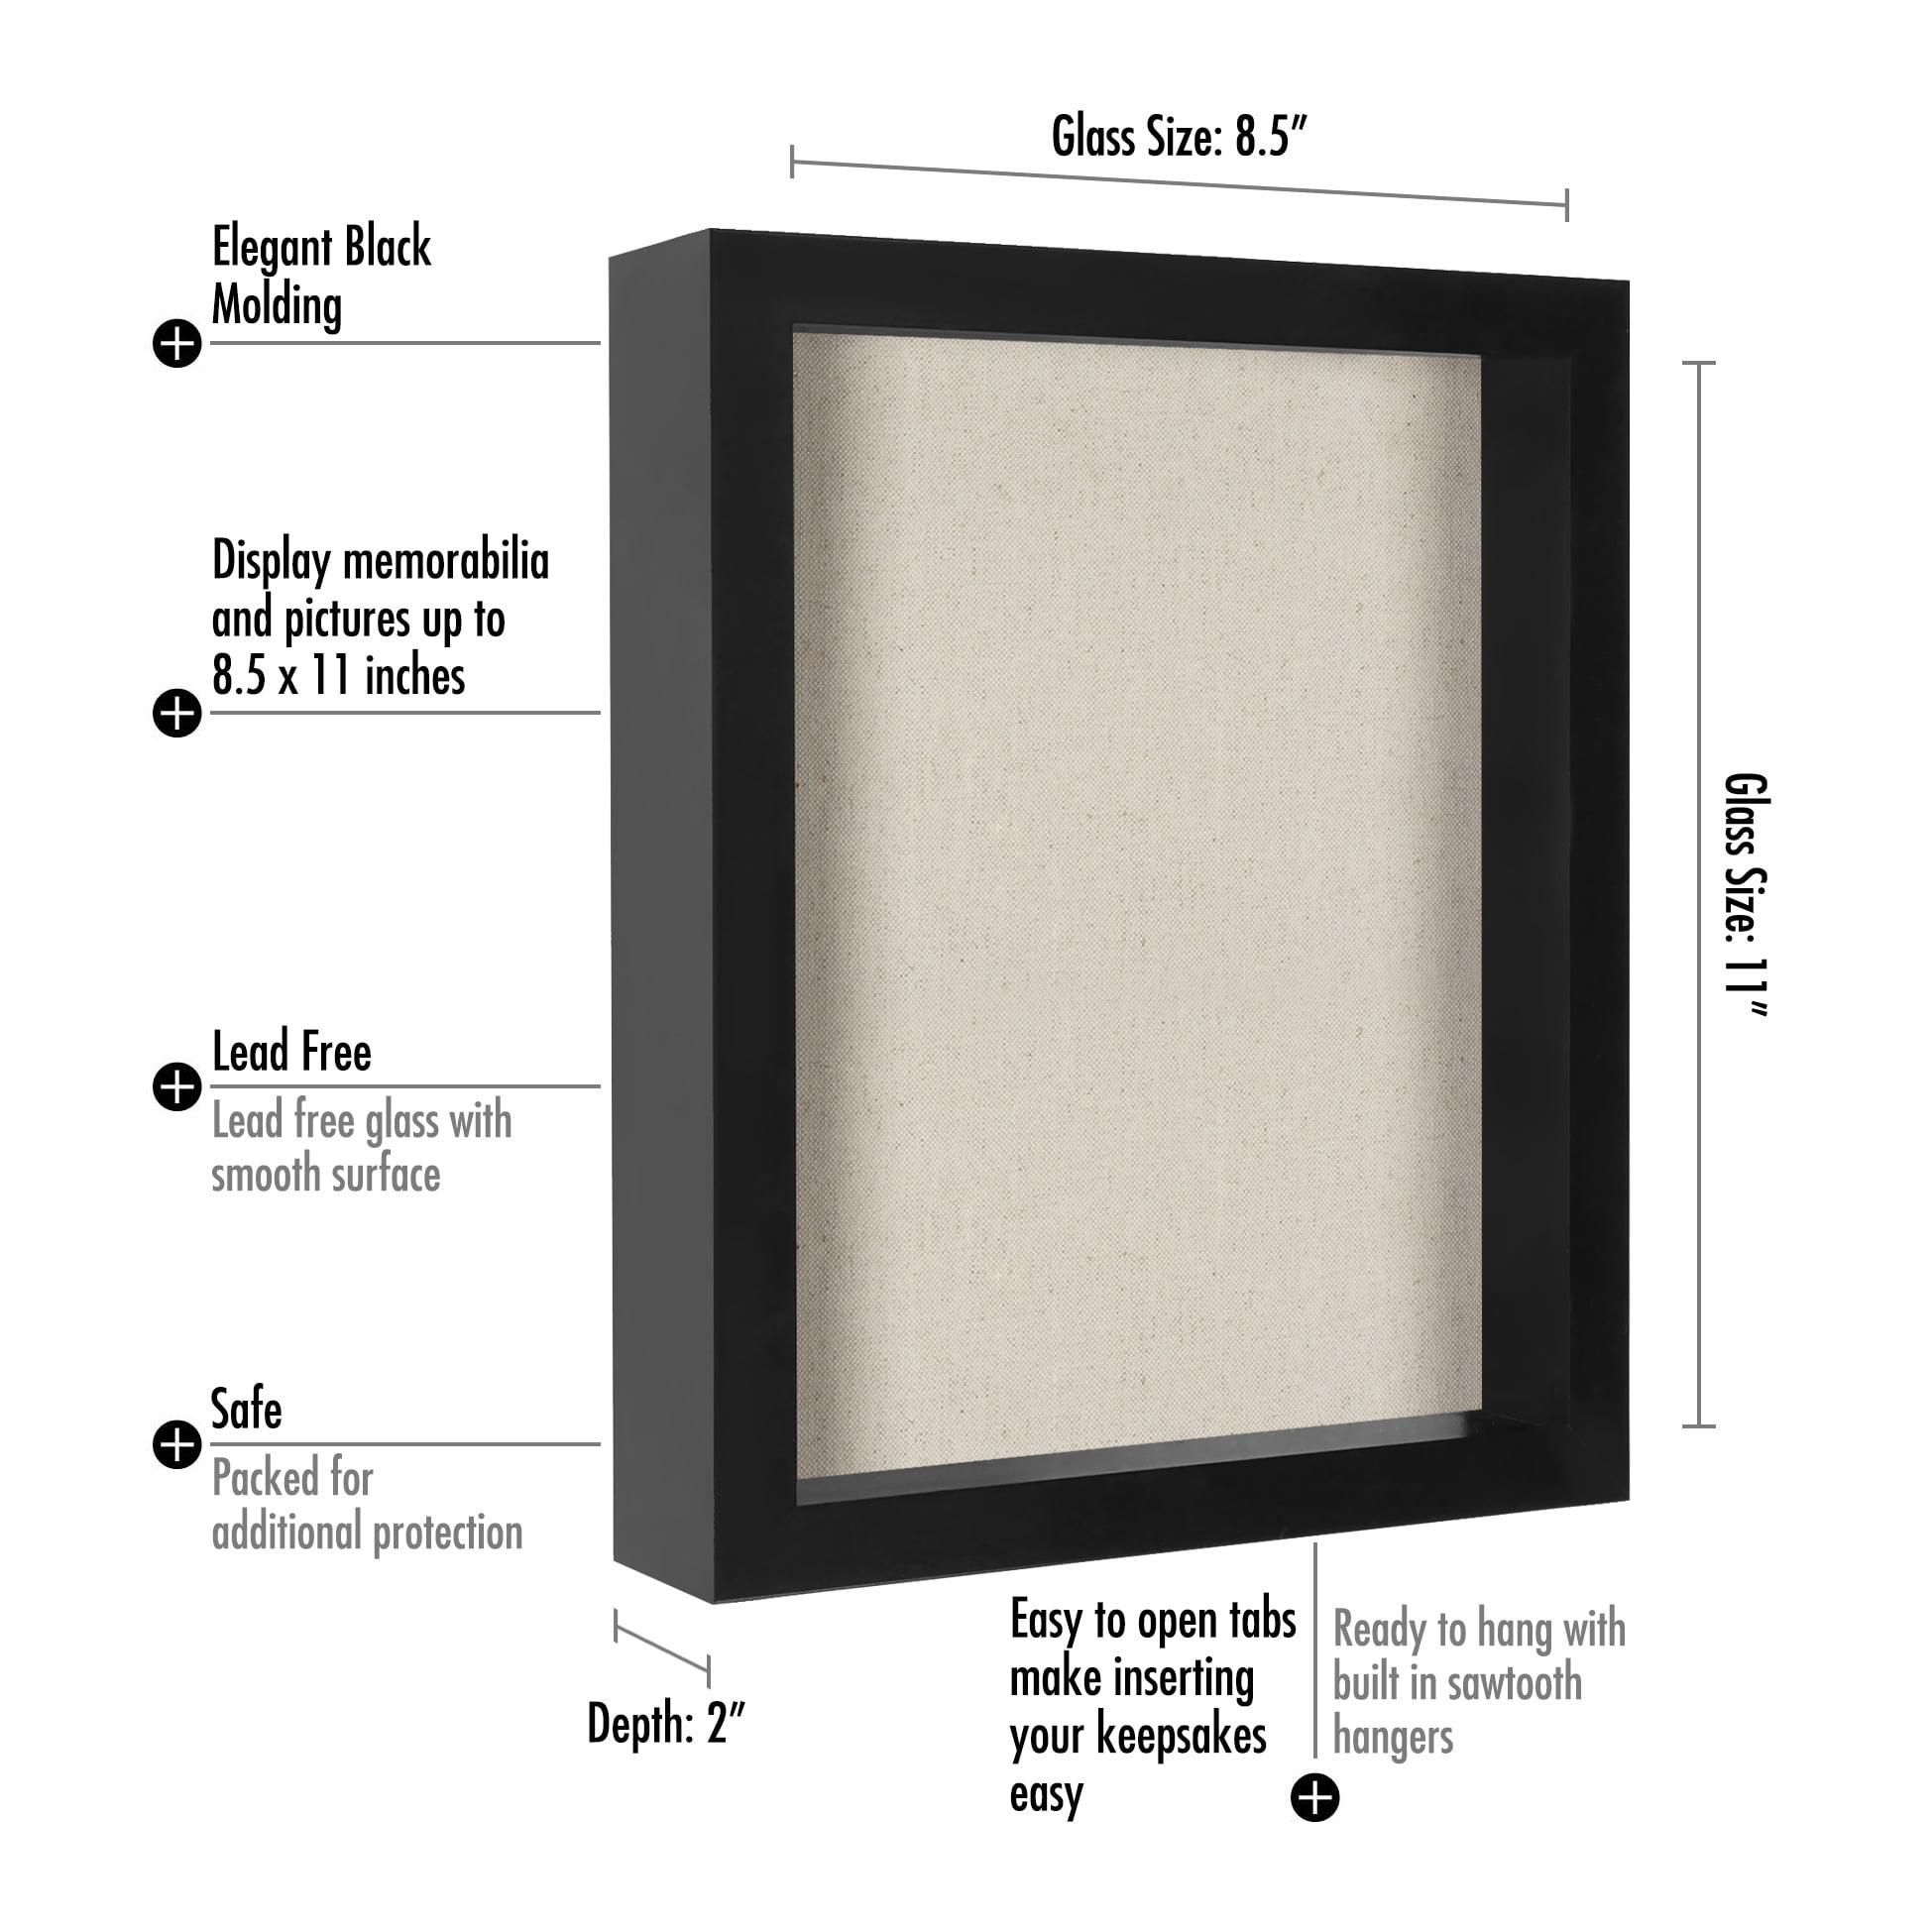 8.5x11 Inch Document Shadow Box Frame with Soft Linen Back - Walmart.com